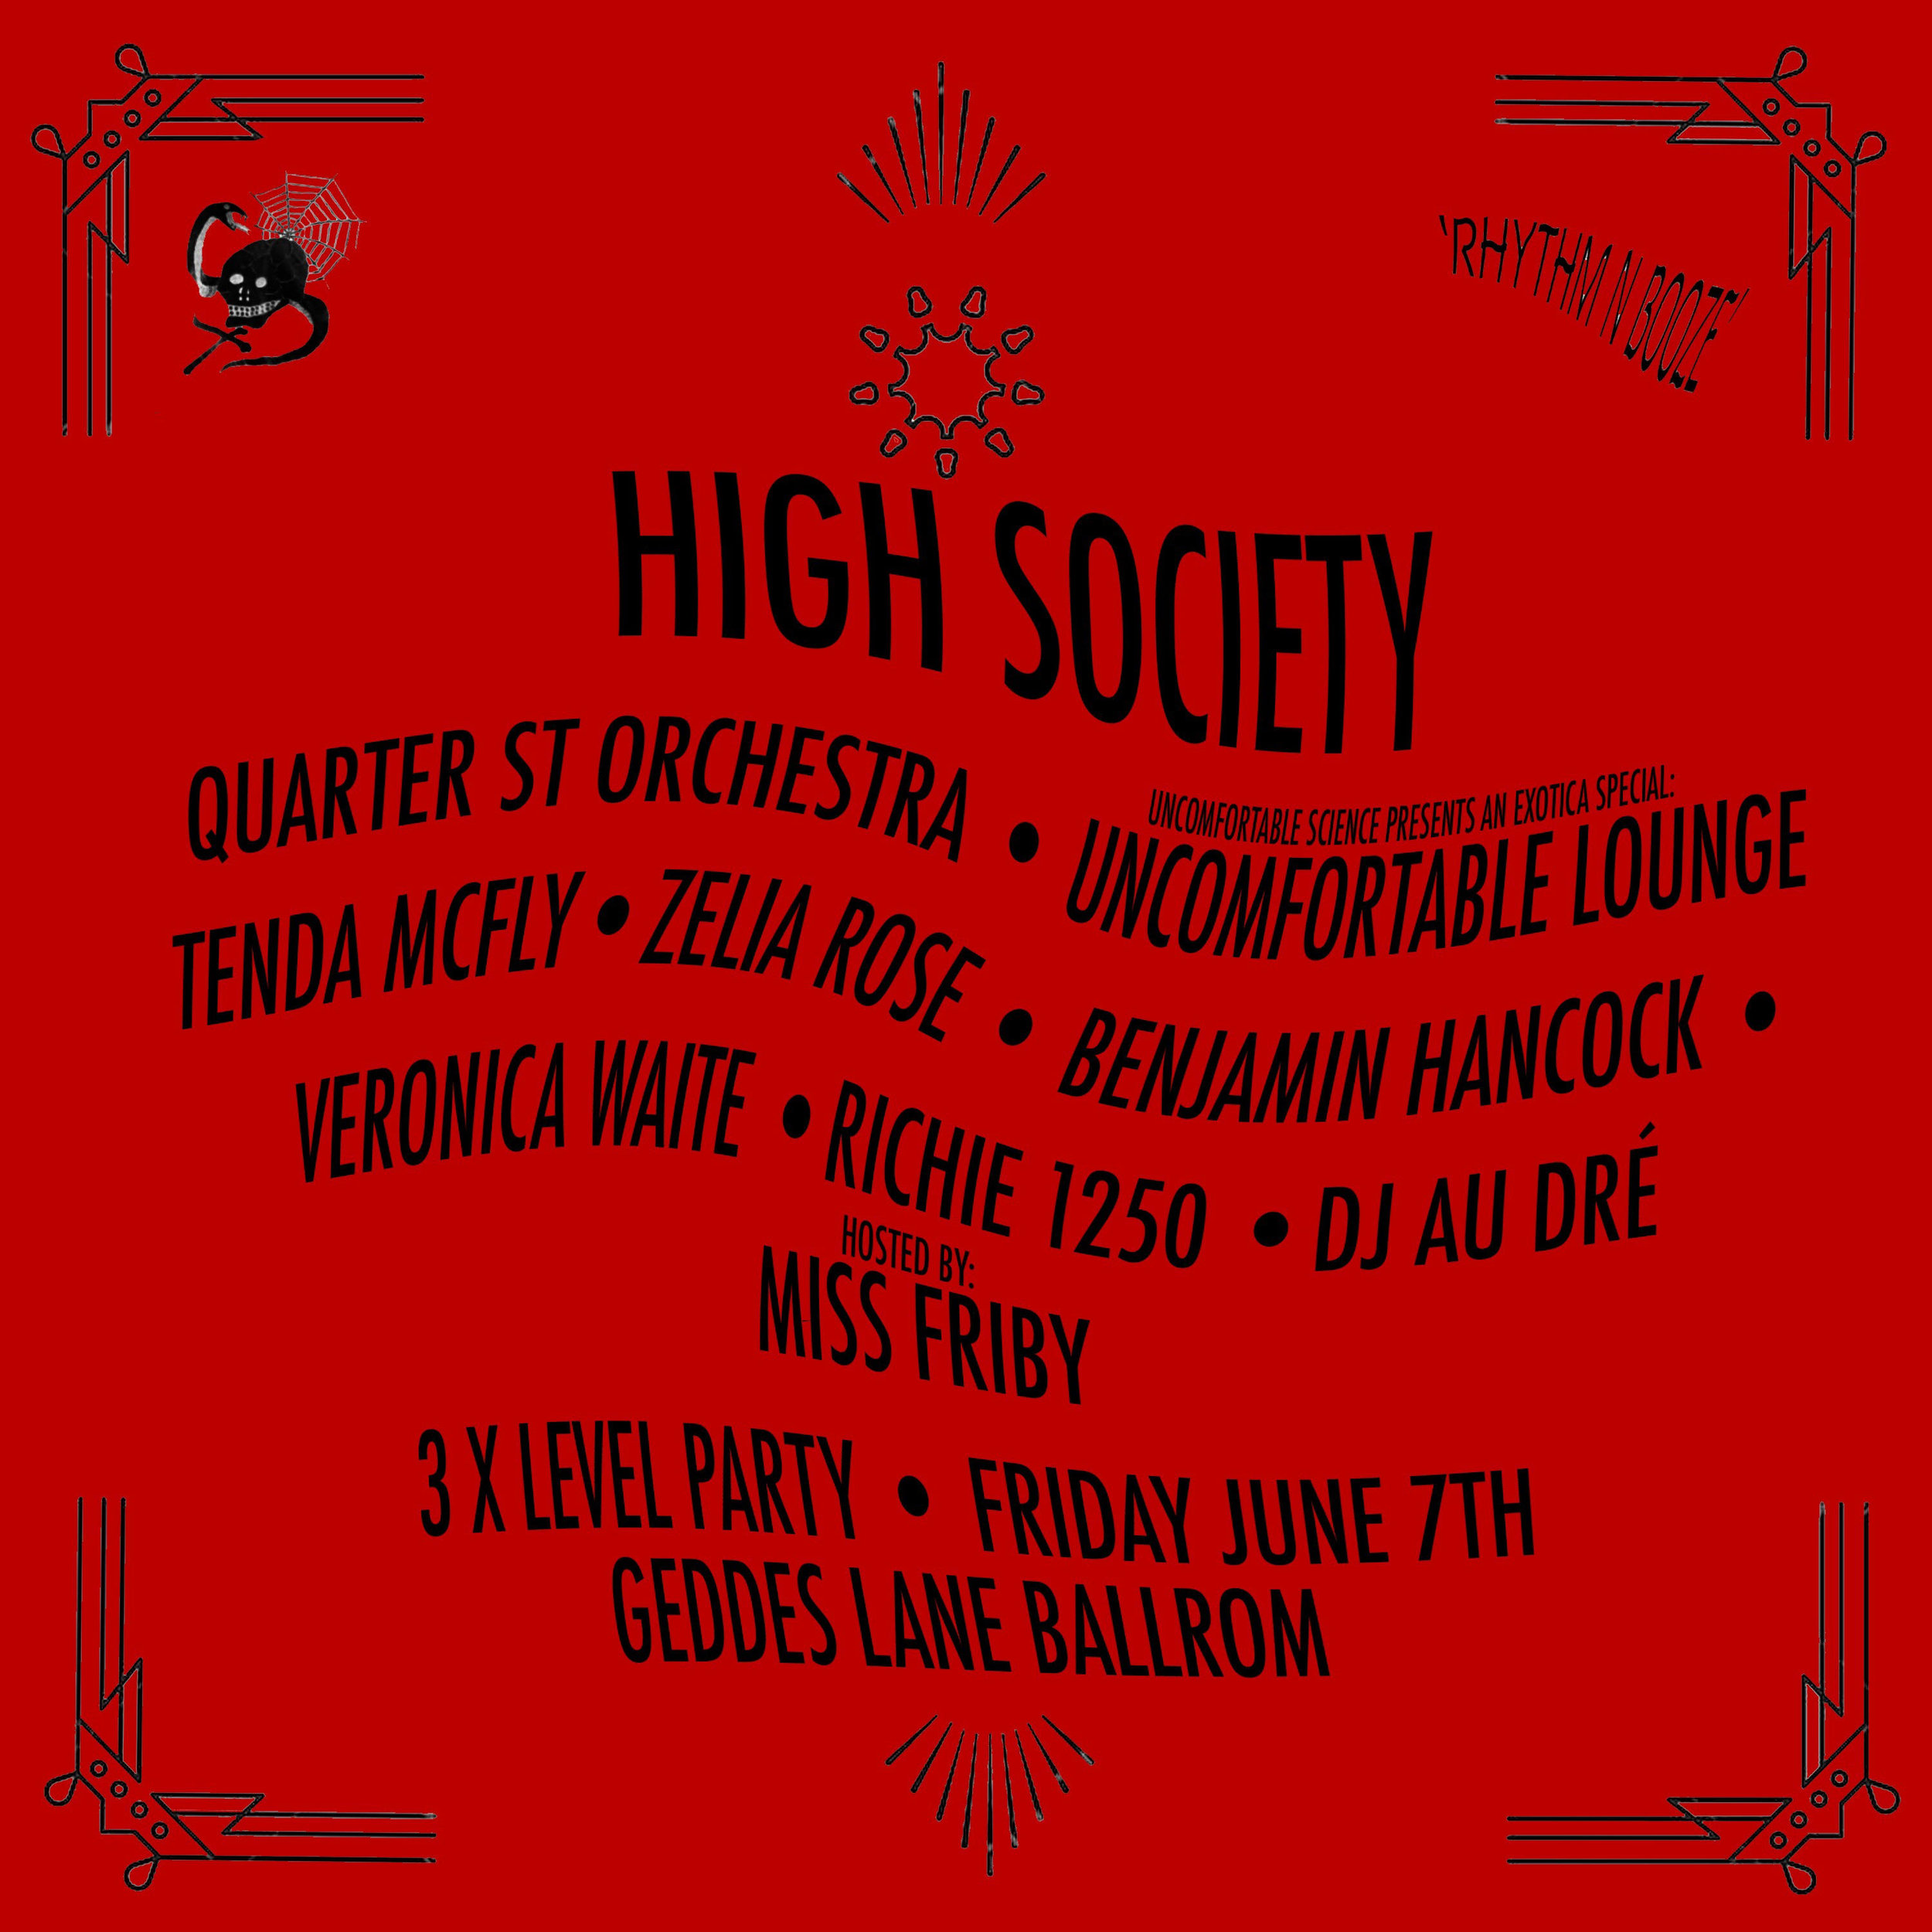 High Society 2.jpg